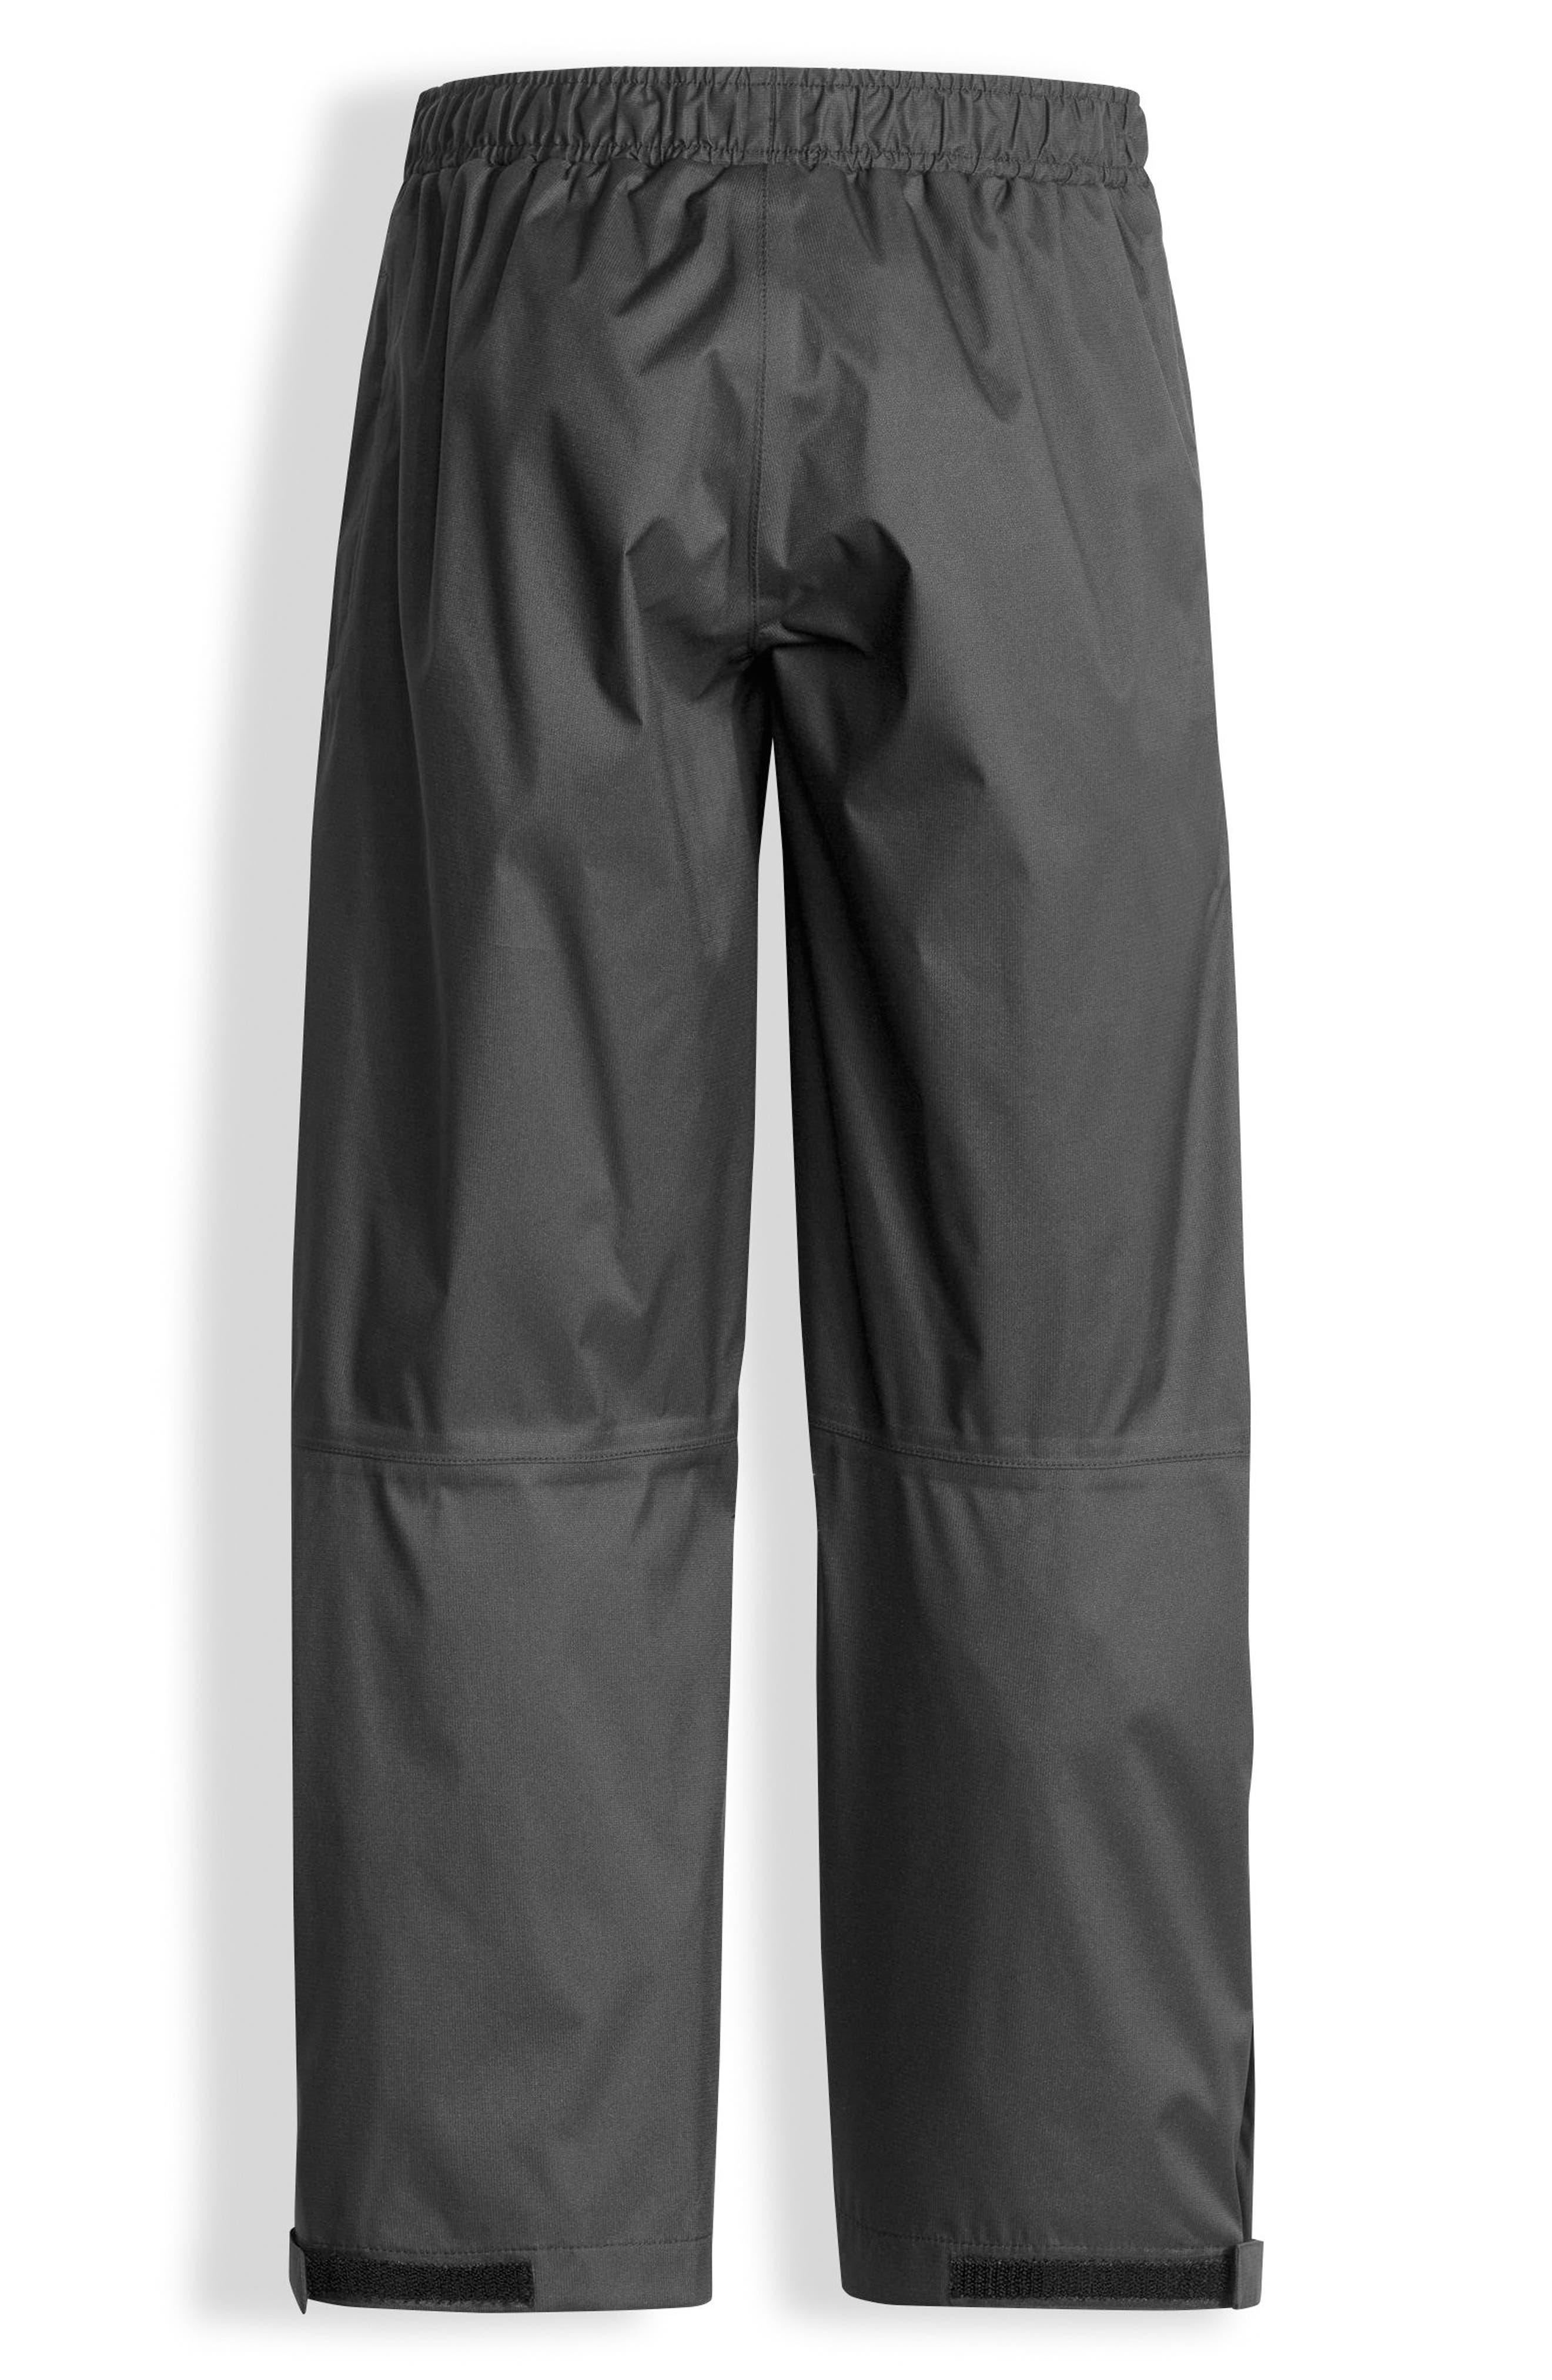 'Resolve' Waterproof Rain Pants,                             Alternate thumbnail 2, color,                             Graphite Grey